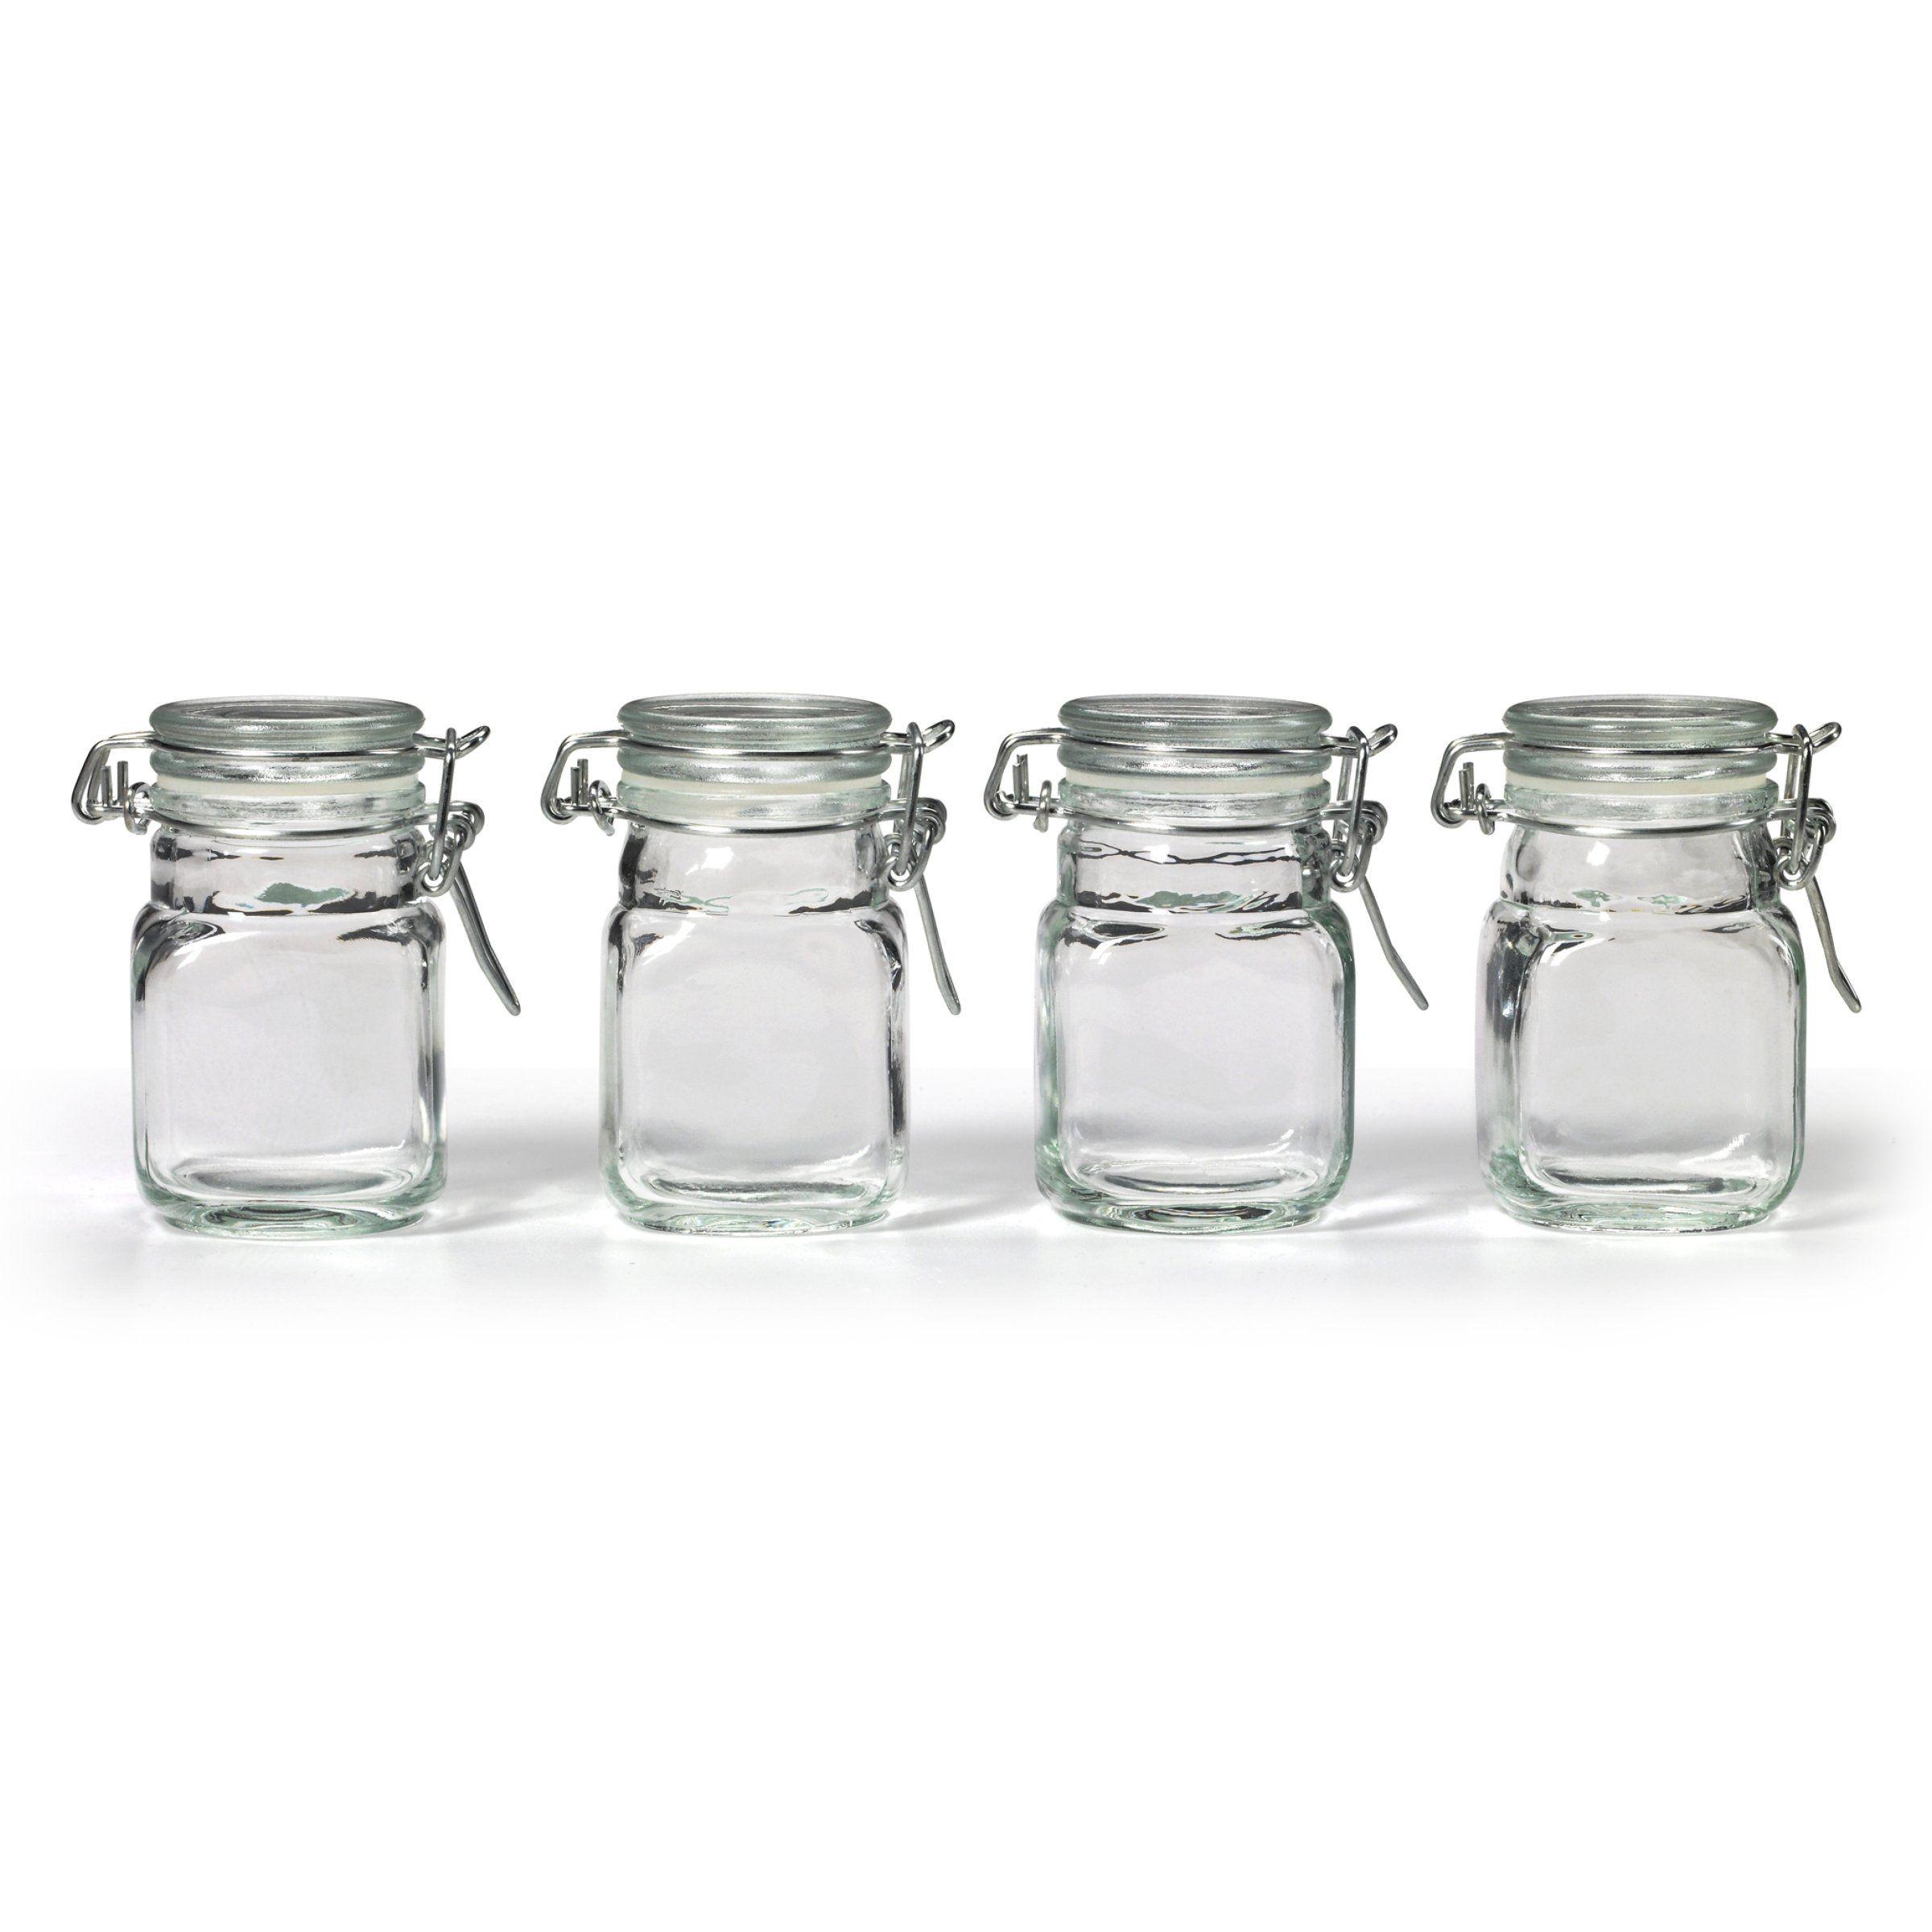 Small Glass Jars,Glass Jars With Airtight Lids 4 oz